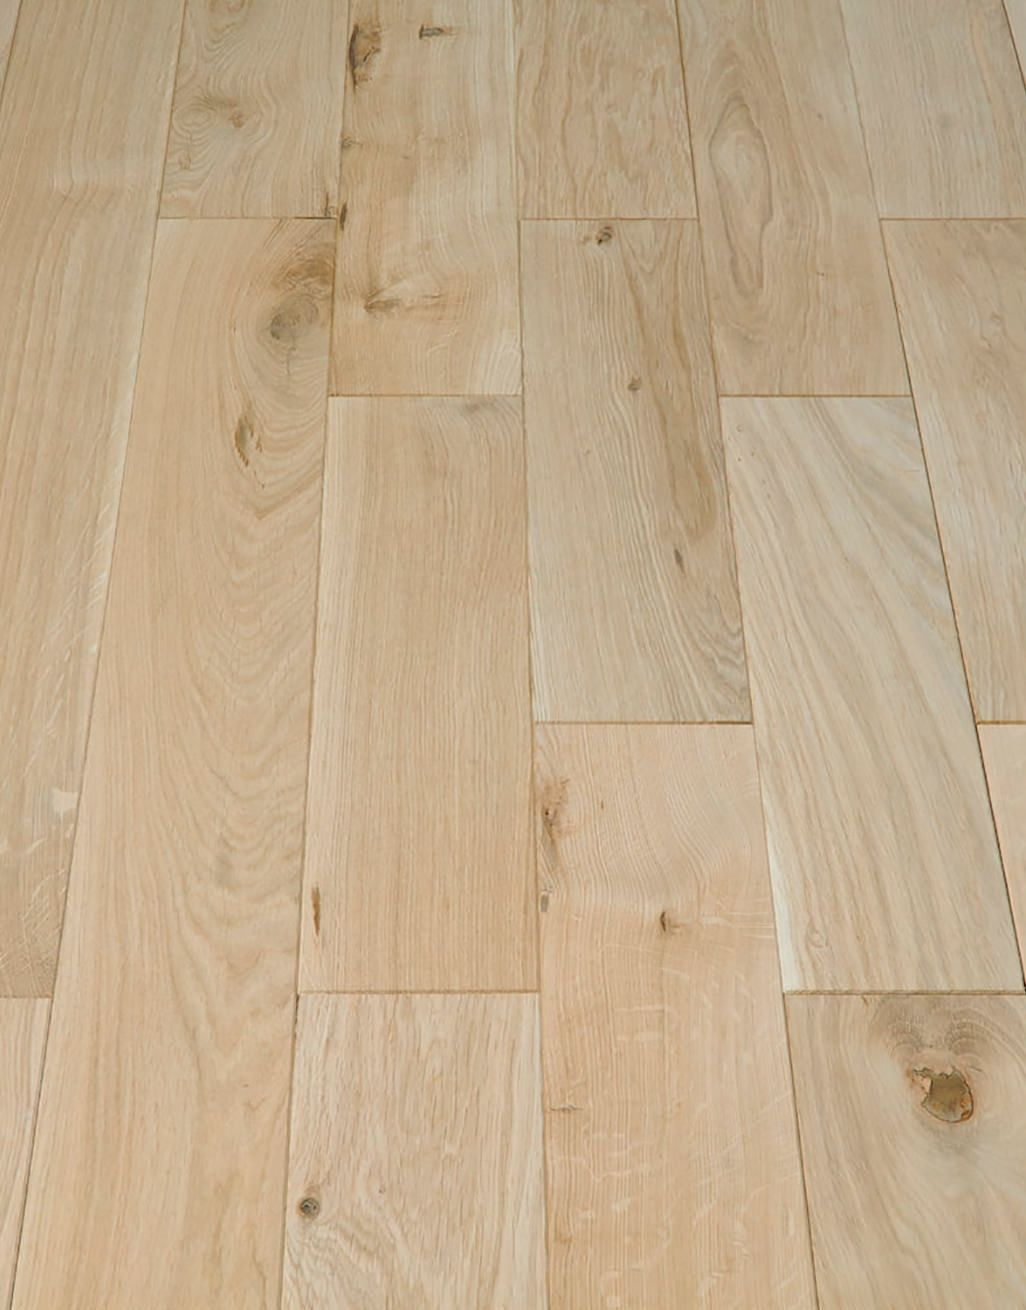 Unfinished Oak 130mm Wide Solid Wood Flooring Solid wood